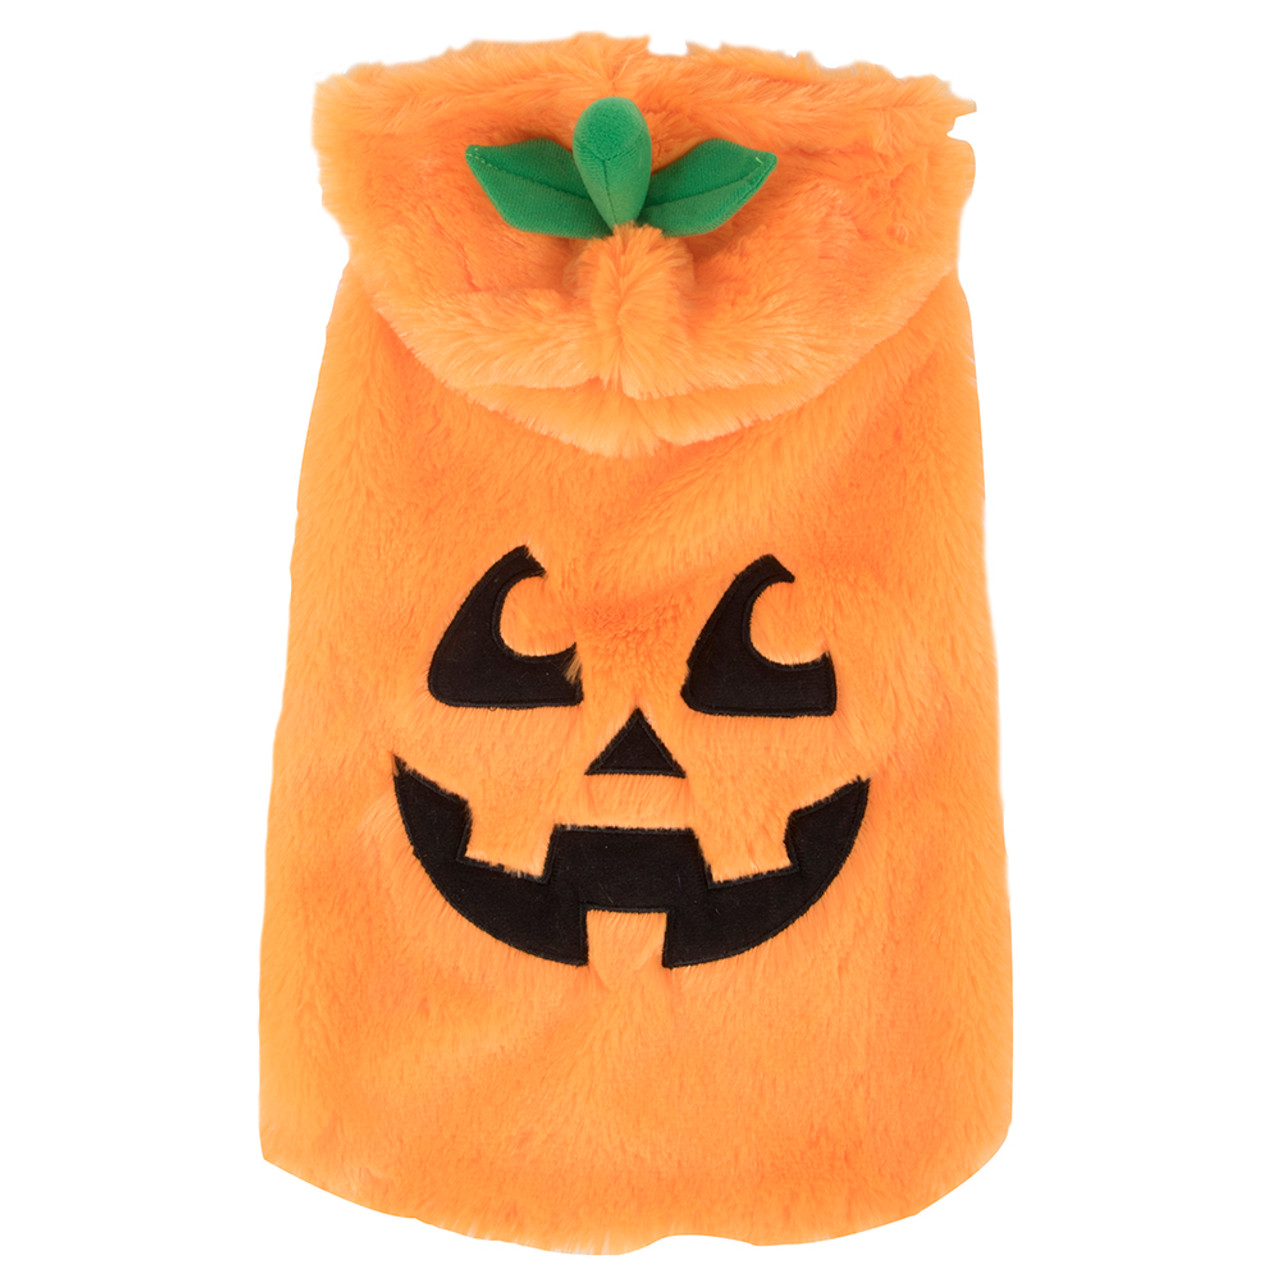 SimplyDog Halloween Jack-O-Lantern Dog Costume